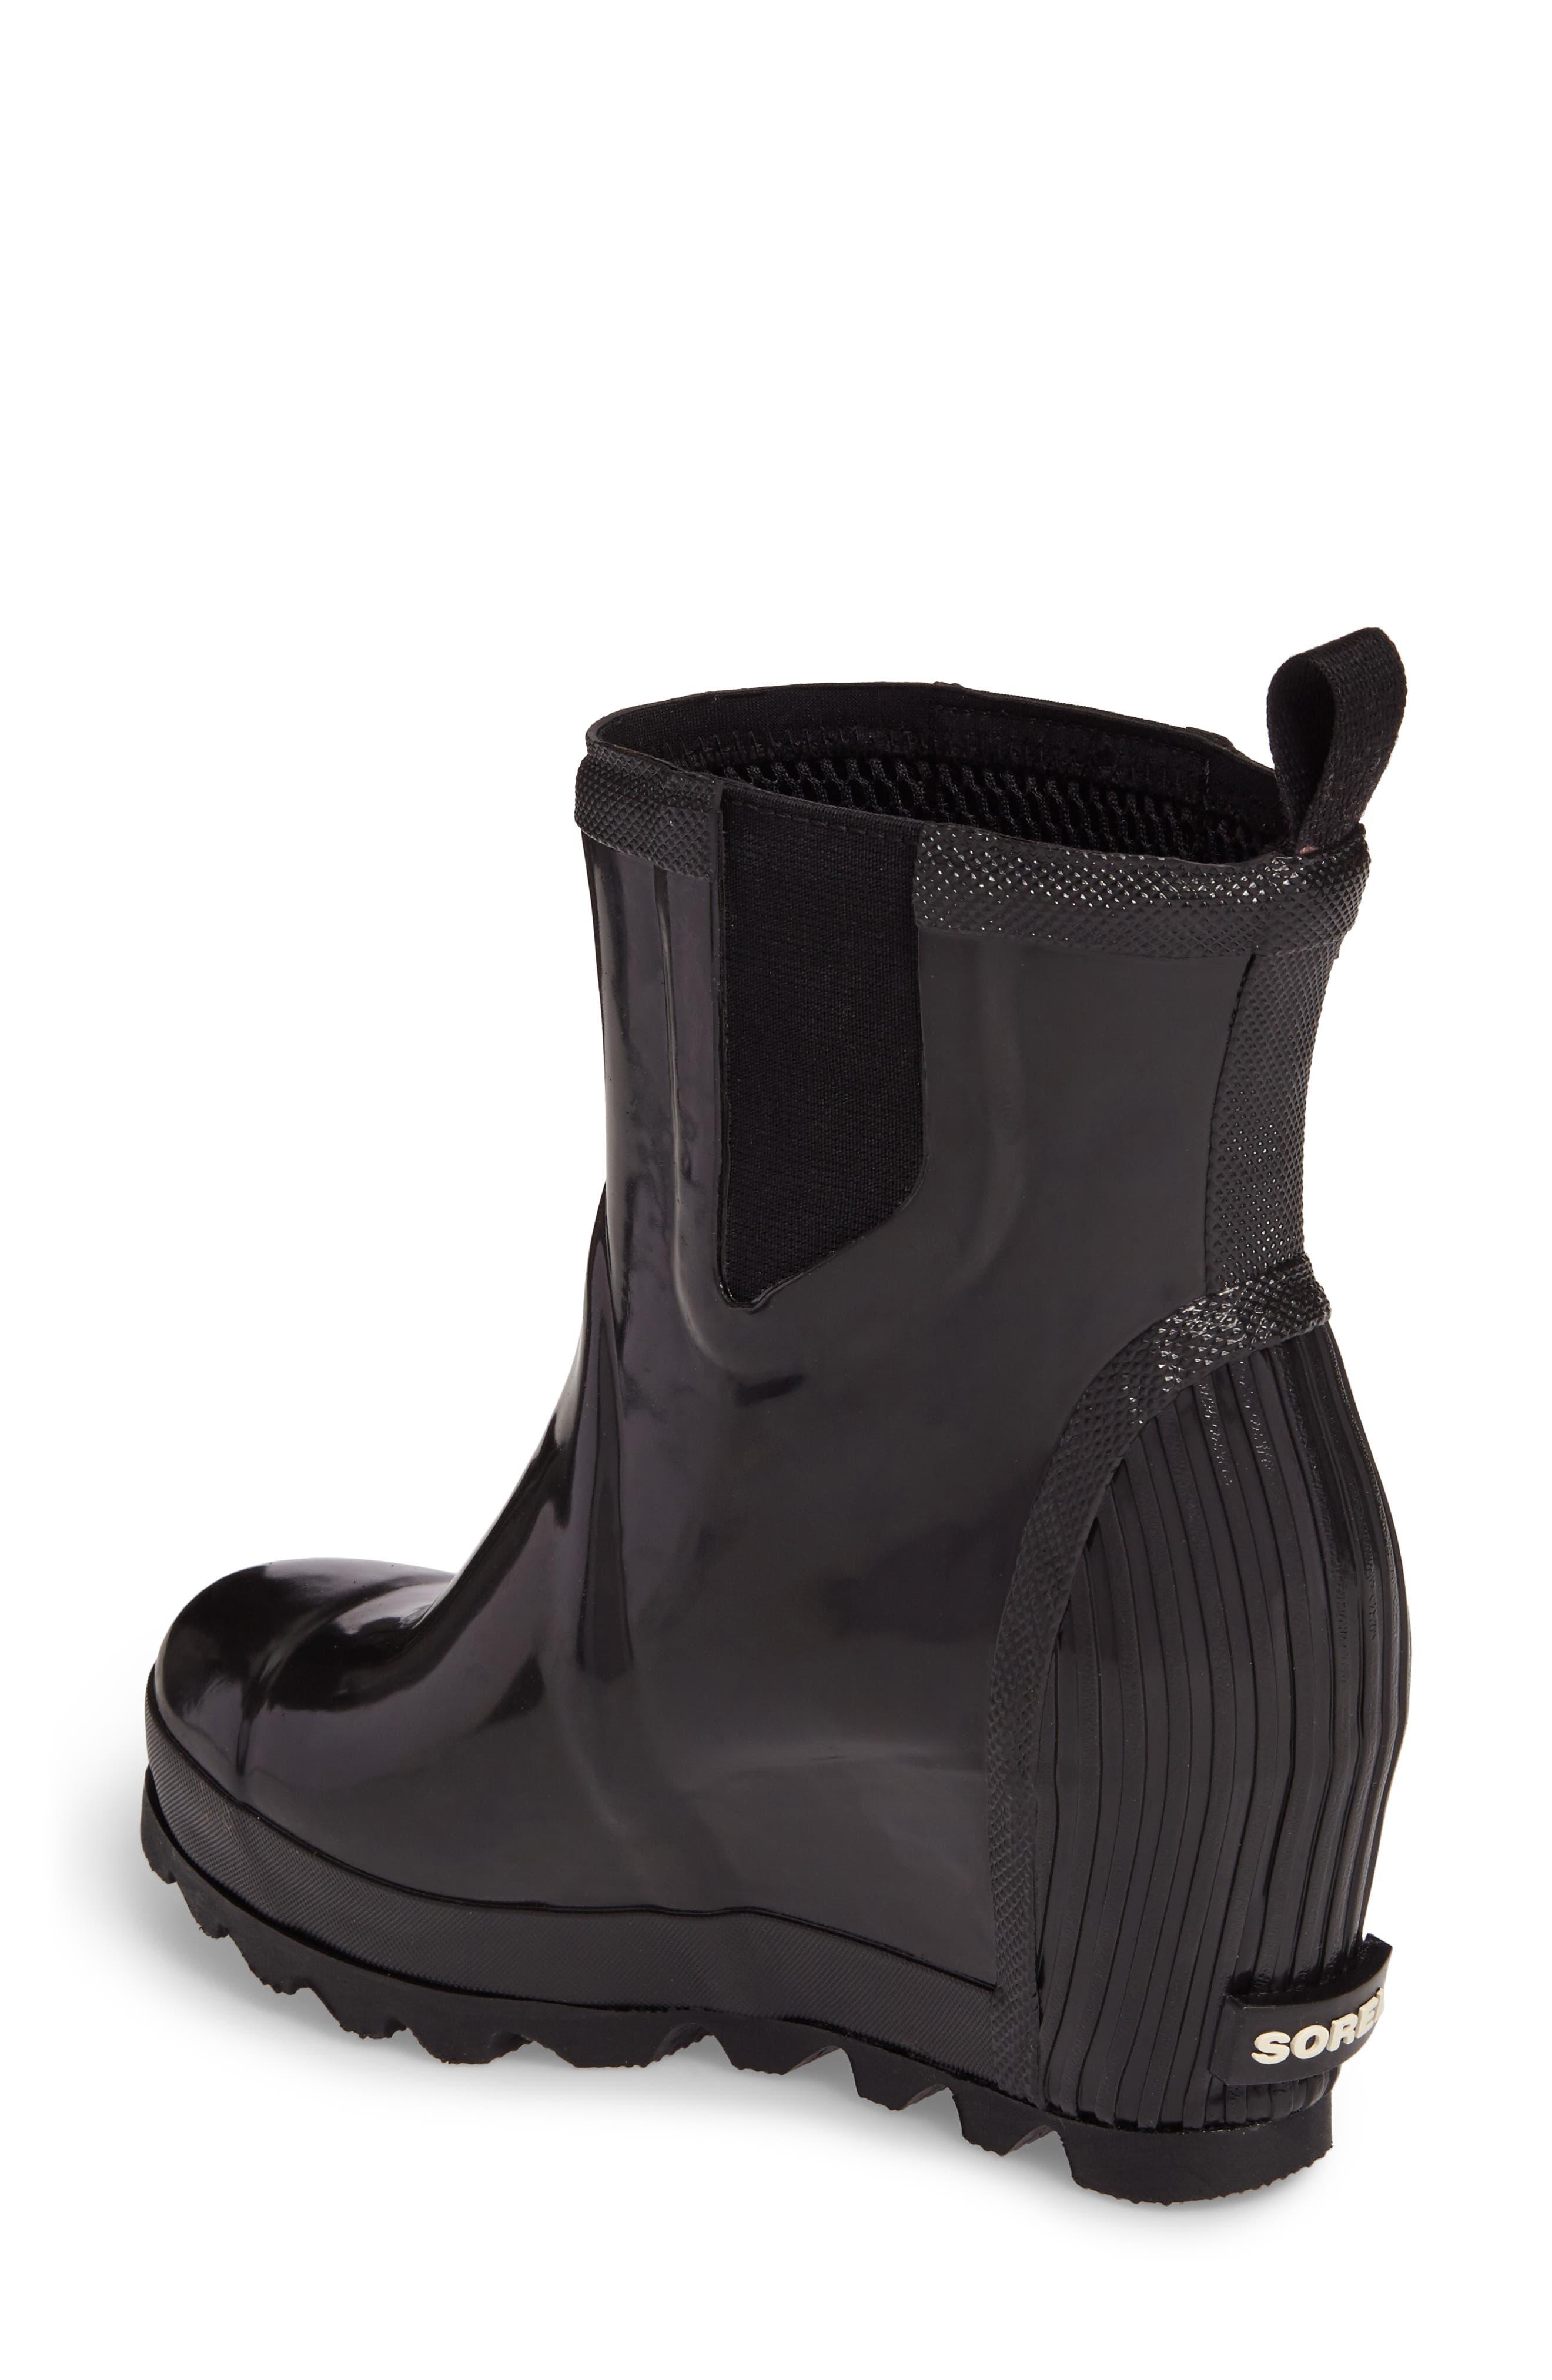 SOREL, Joan Glossy Wedge Waterproof Rain Boot, Alternate thumbnail 2, color, BLACK/ SEA SALT